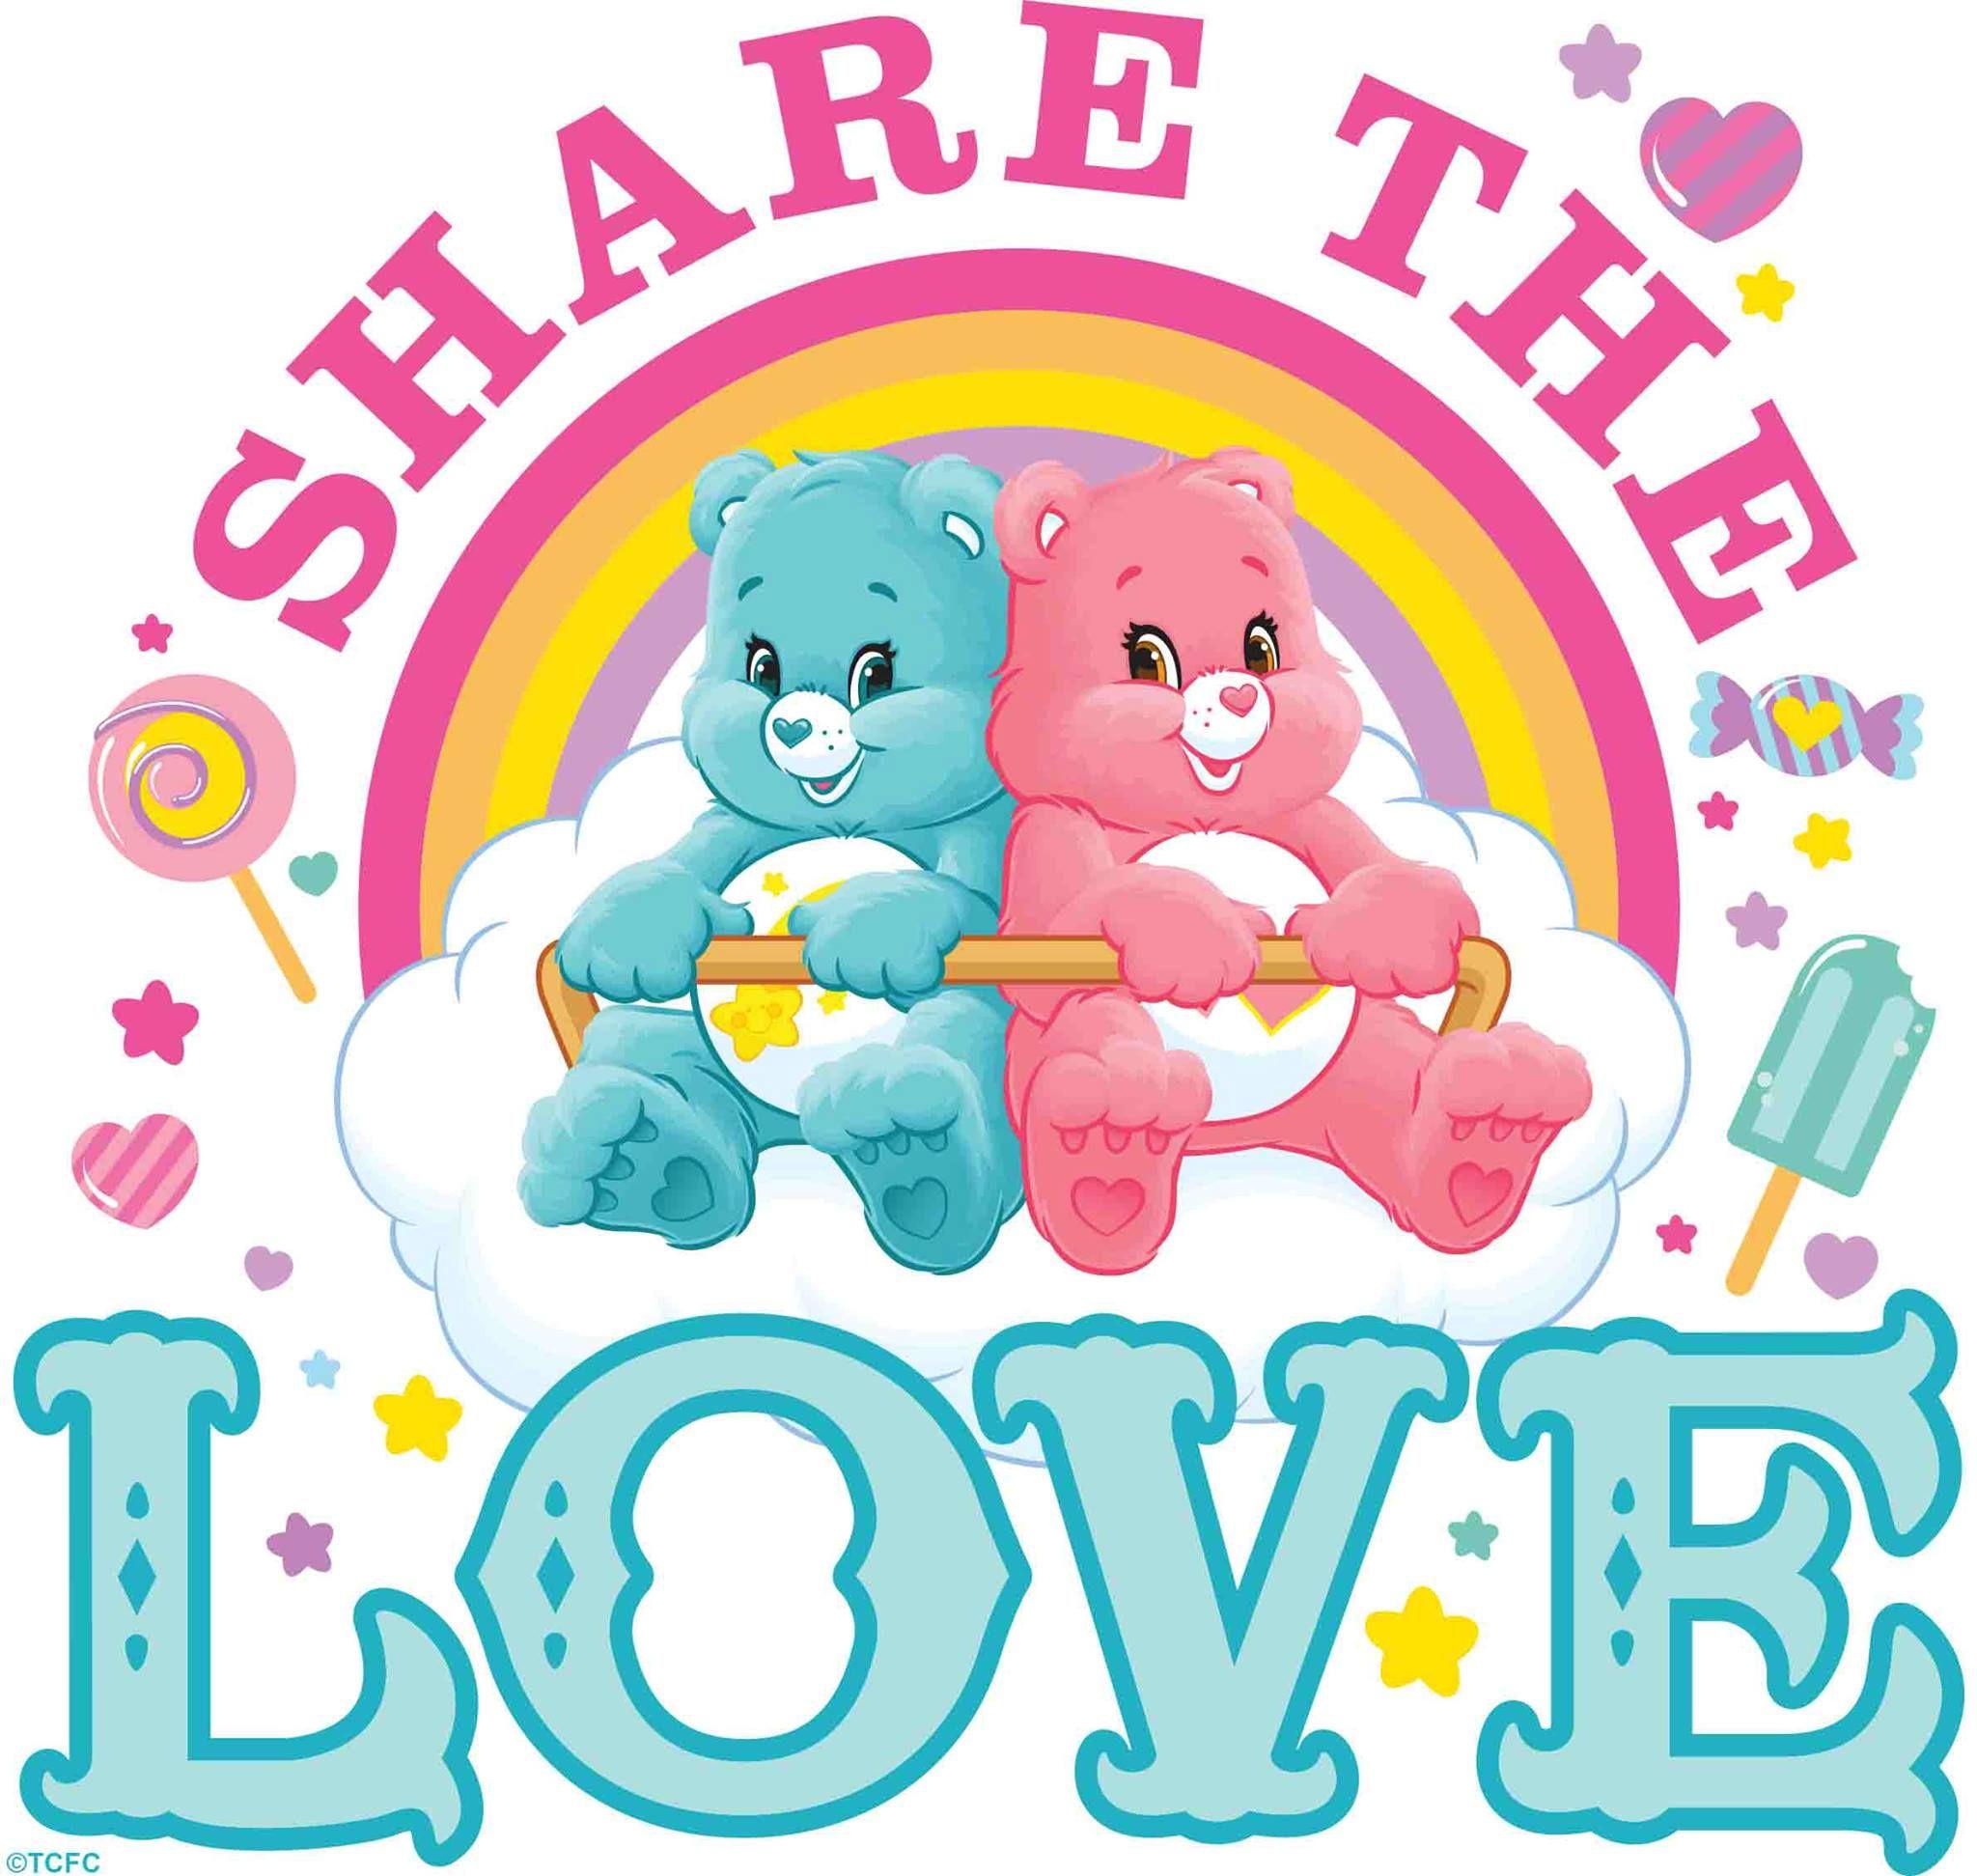 Care bears wish bear and lovealot bear share the love